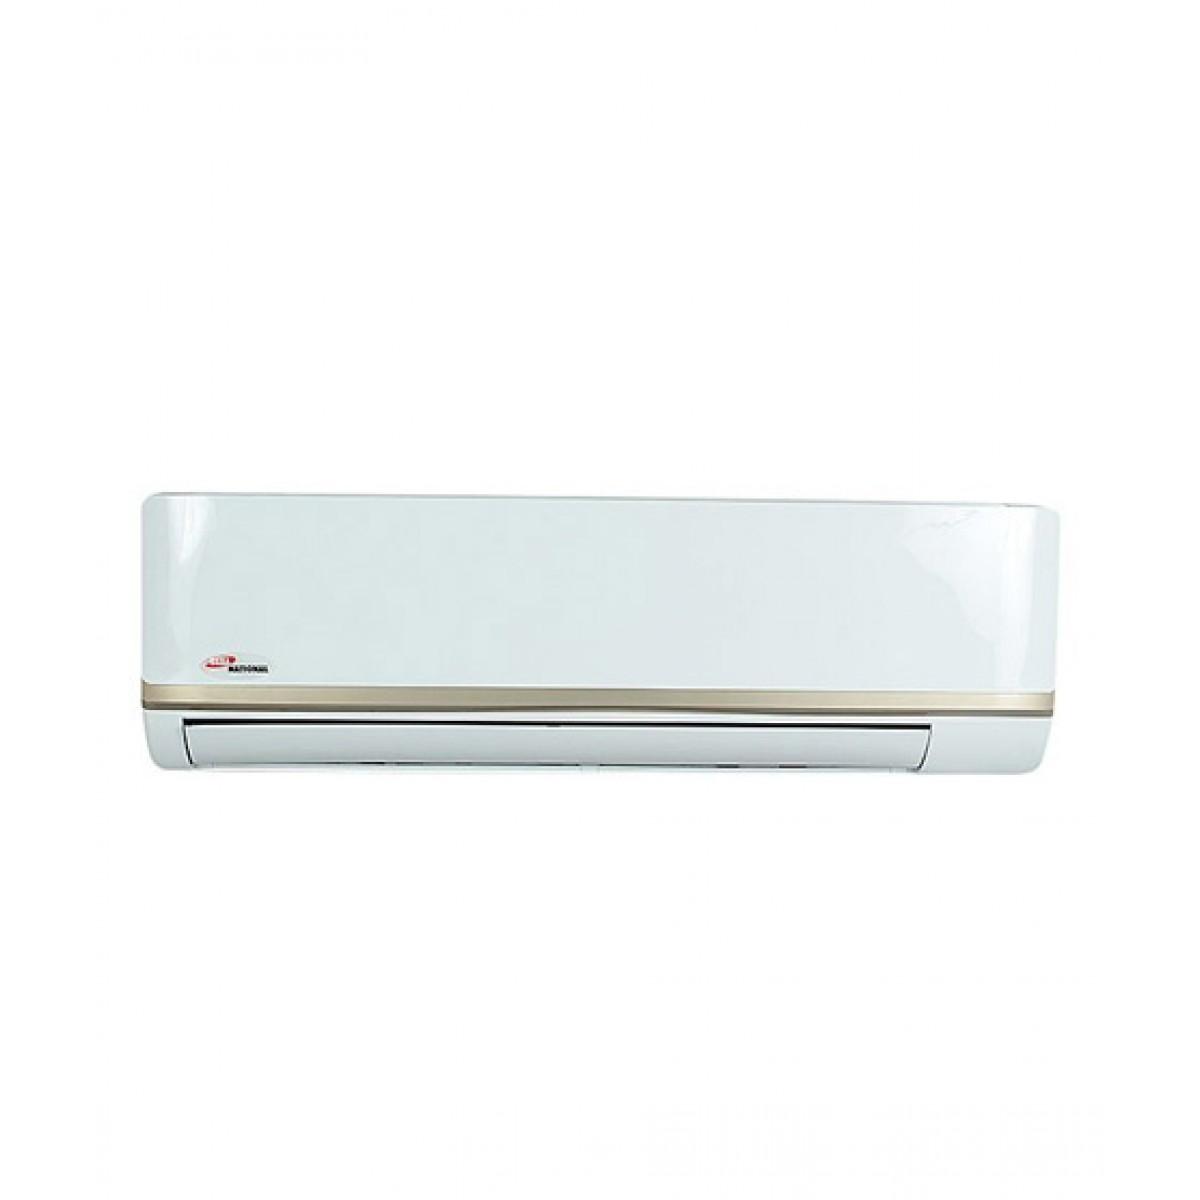 Gaba National 1.0 Ton Split Air Conditioner (GNS-1613HD)